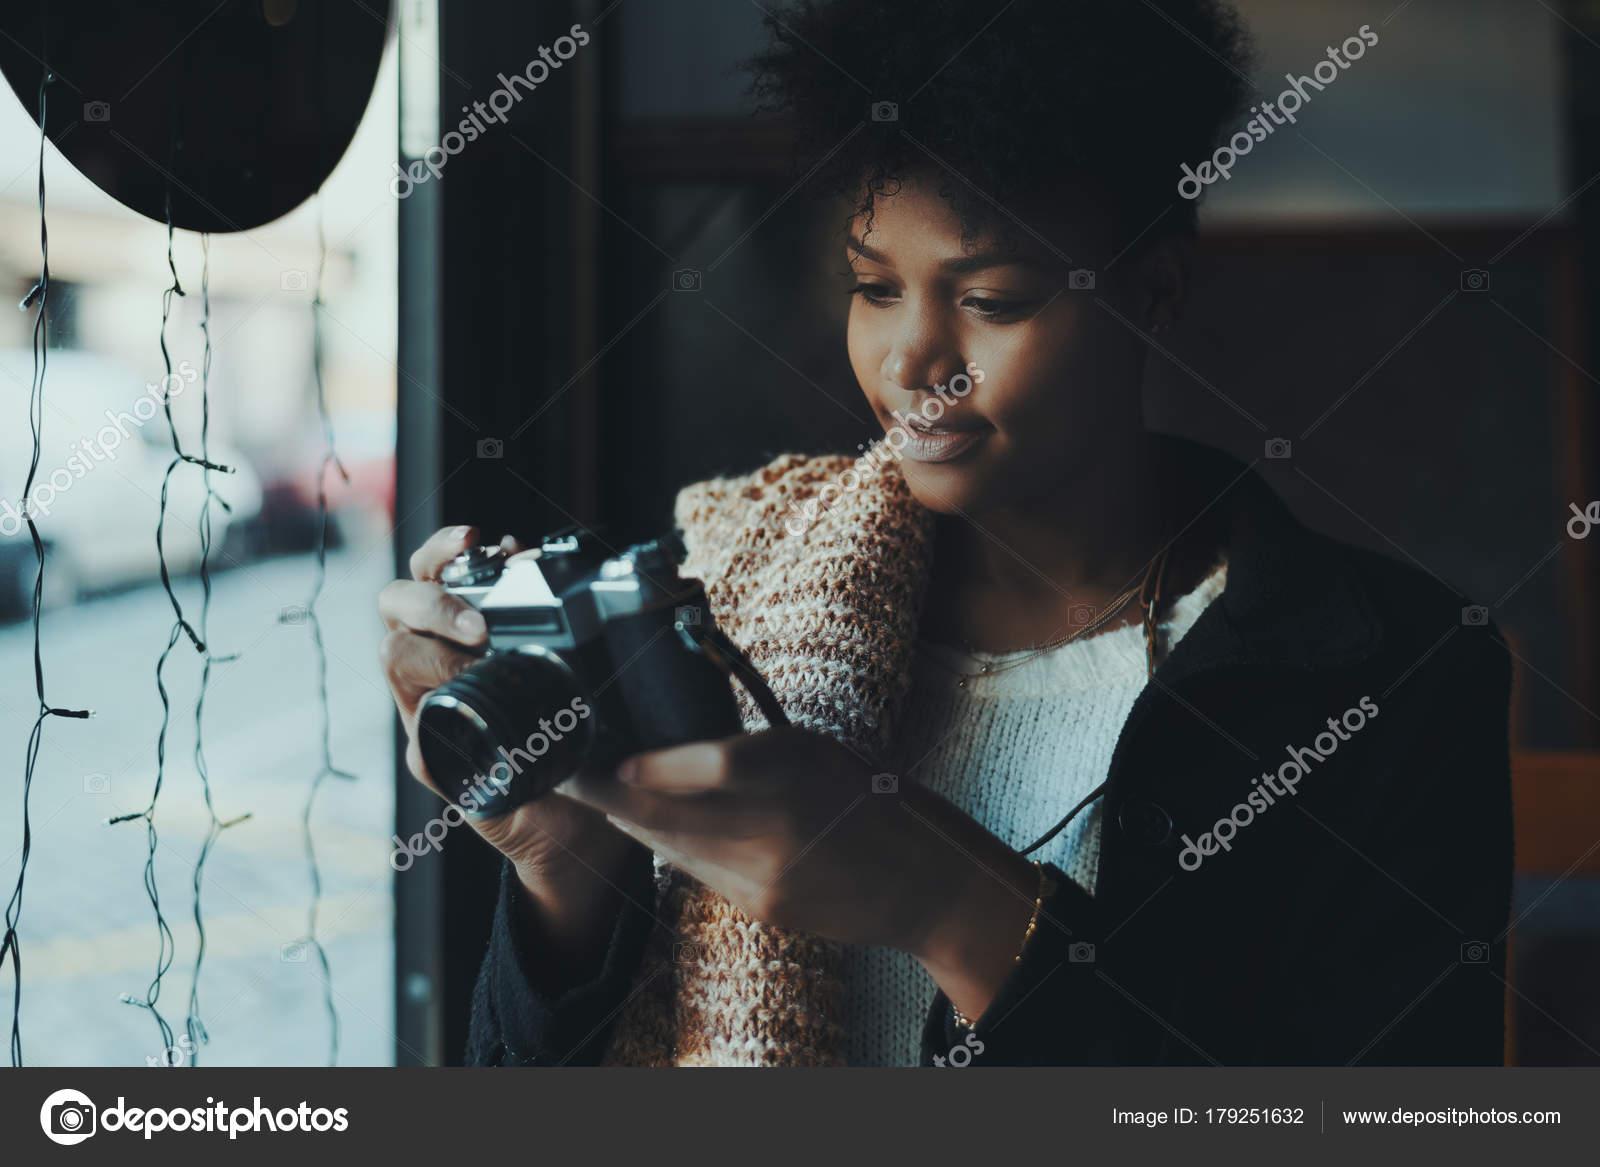 Ebony κορίτσια εικόνες